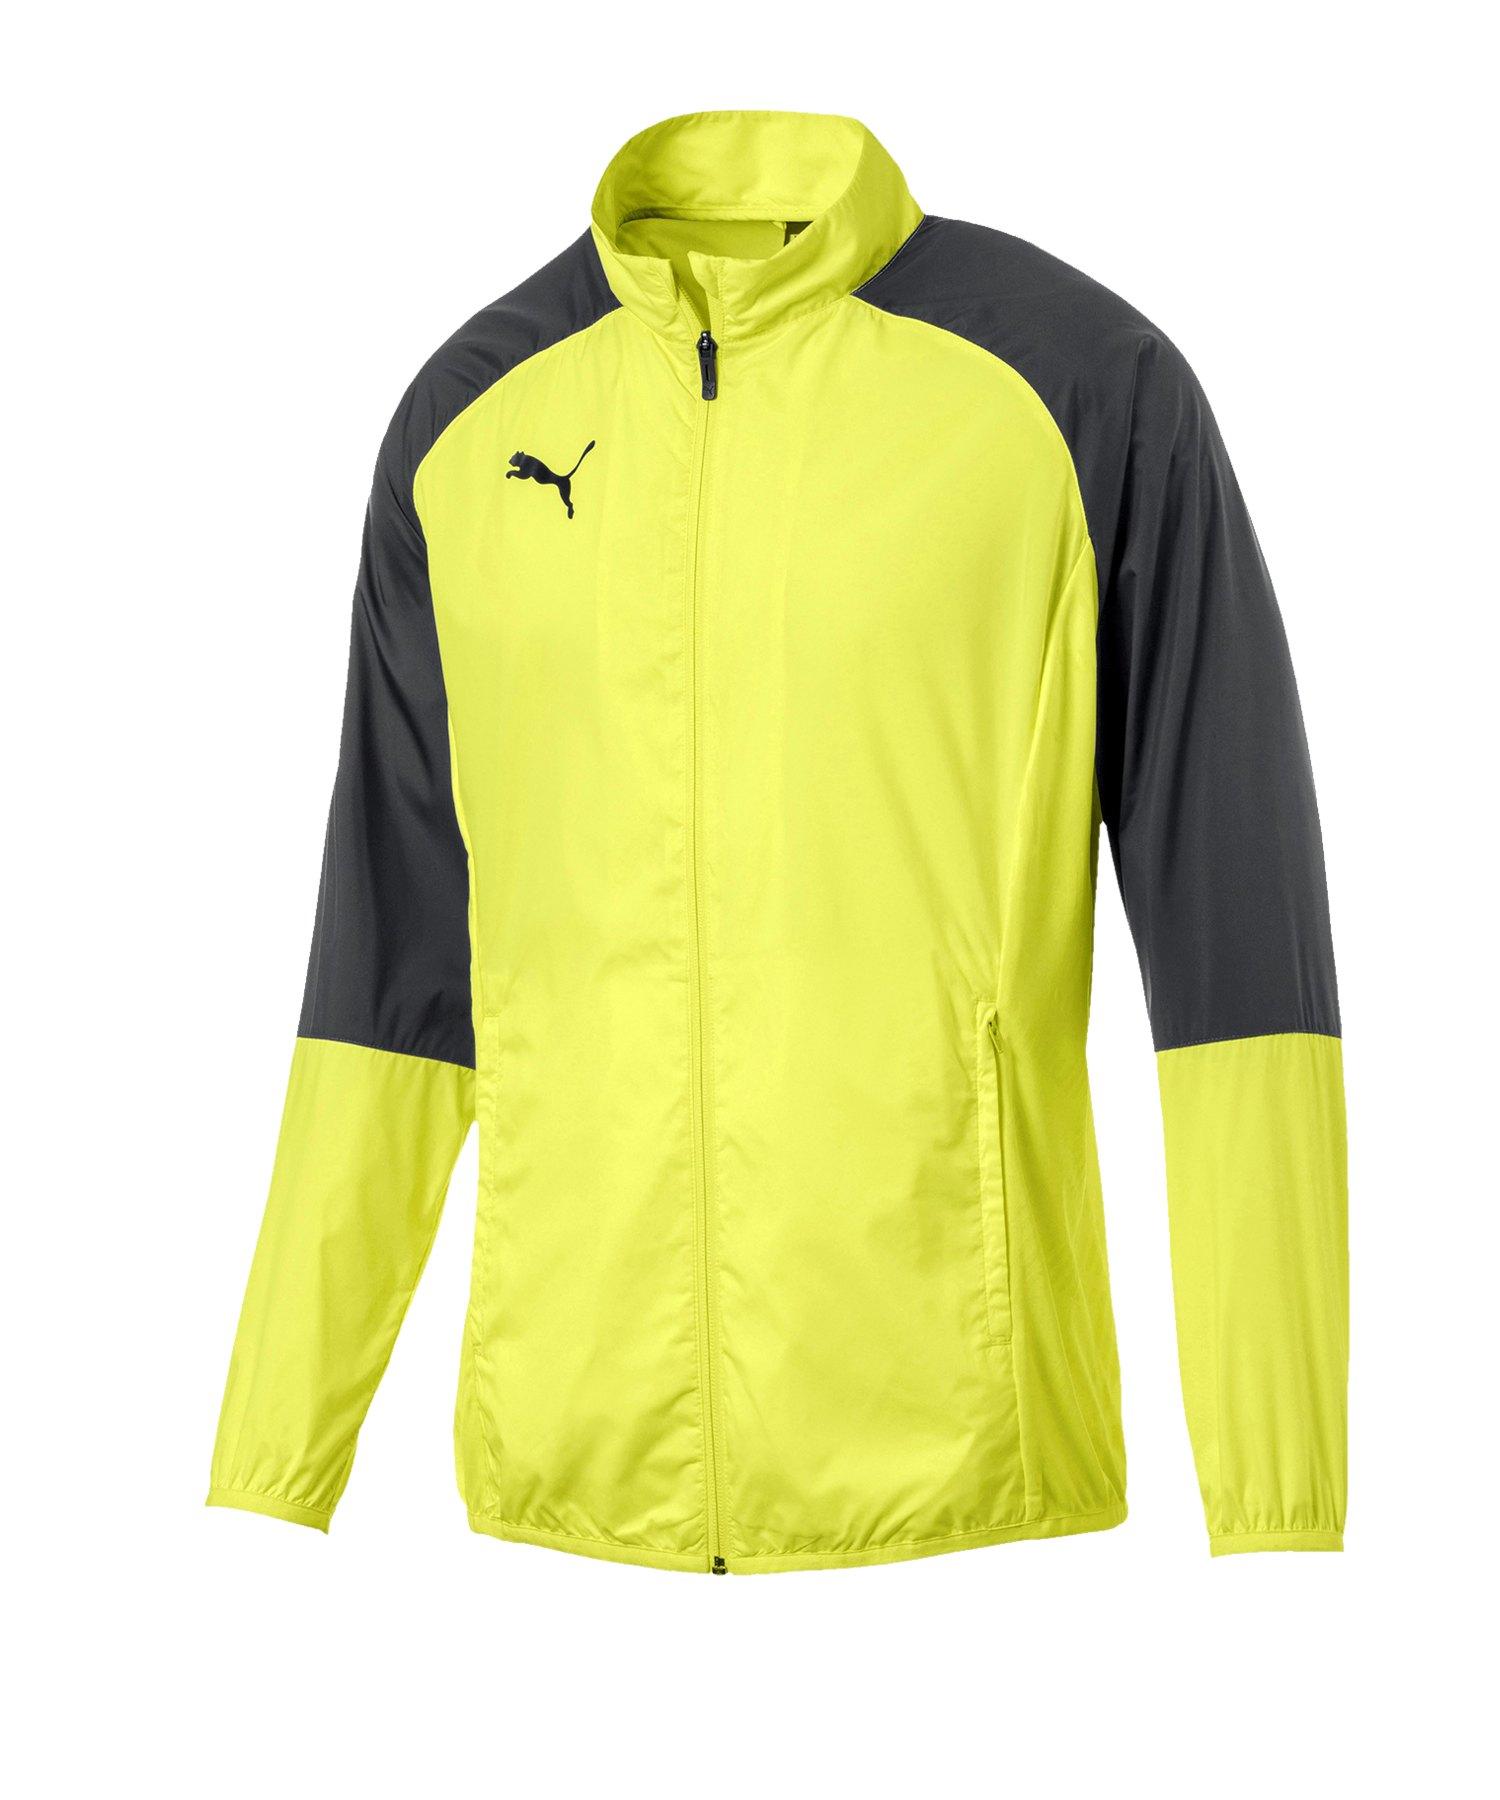 PUMA CUP Sideline Core Woven Jacket Kids Gelb F16 - gelb